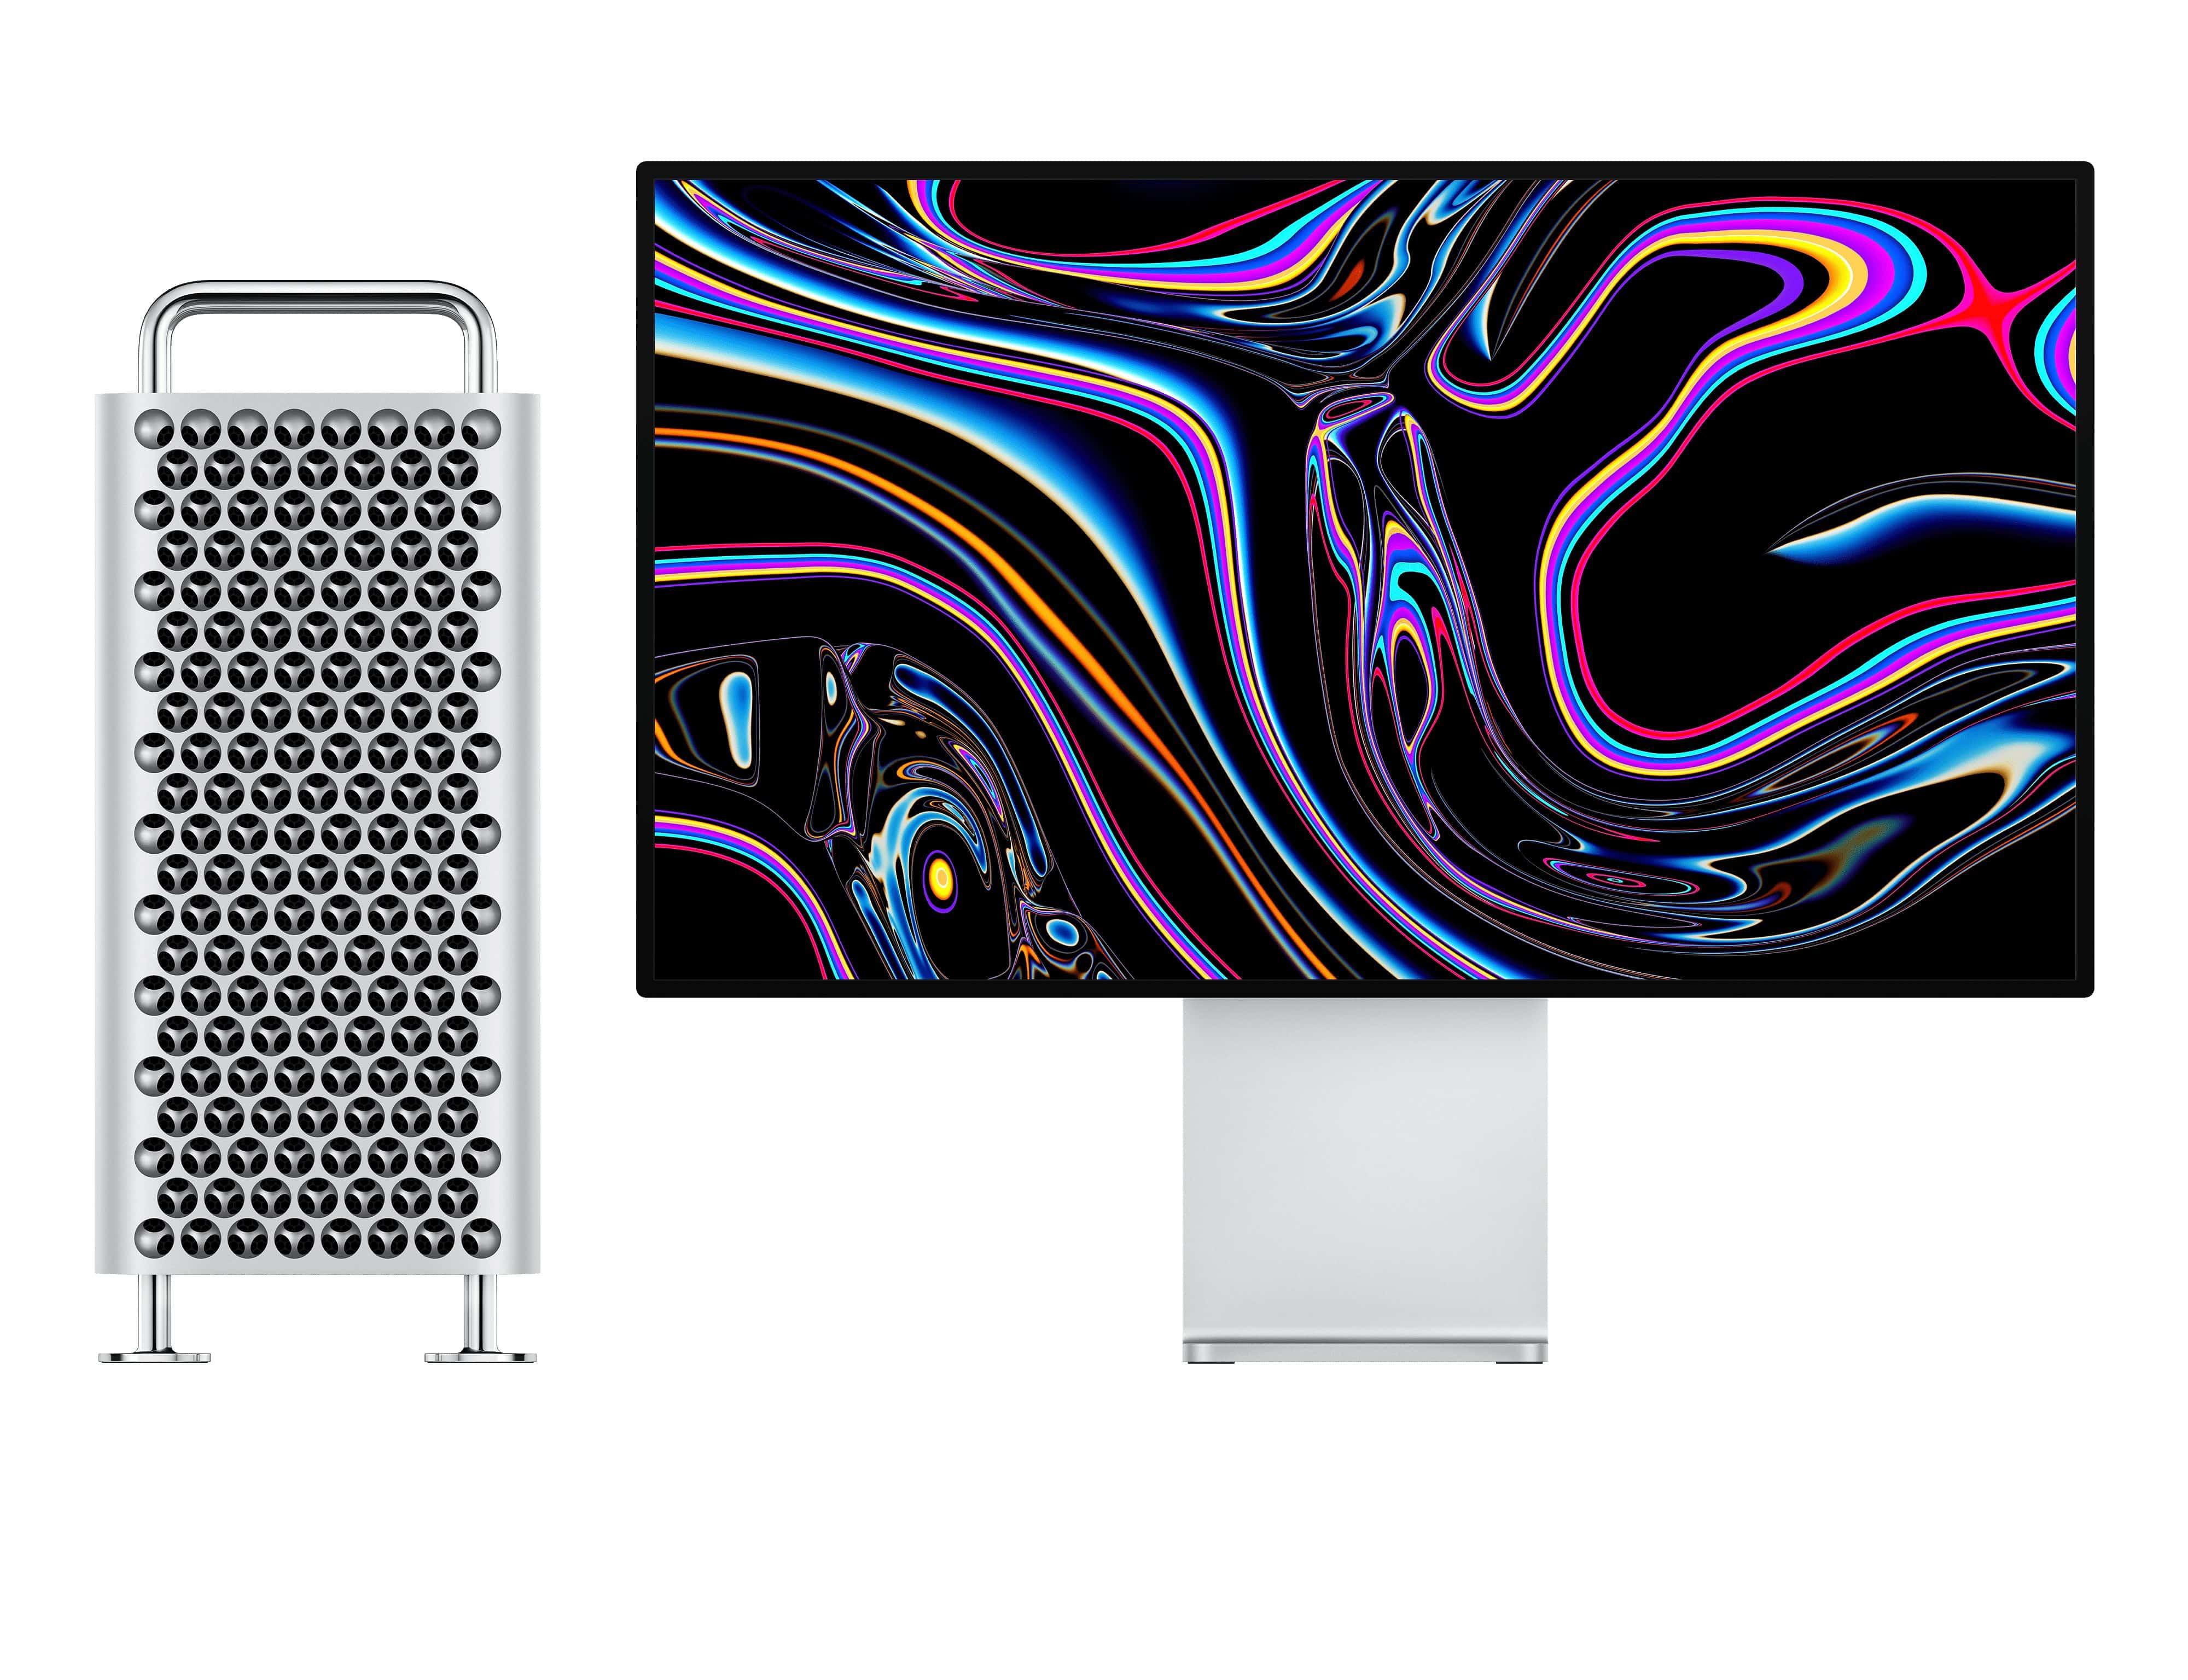 mac-pro-xdr-display-2019-laptopvang.com